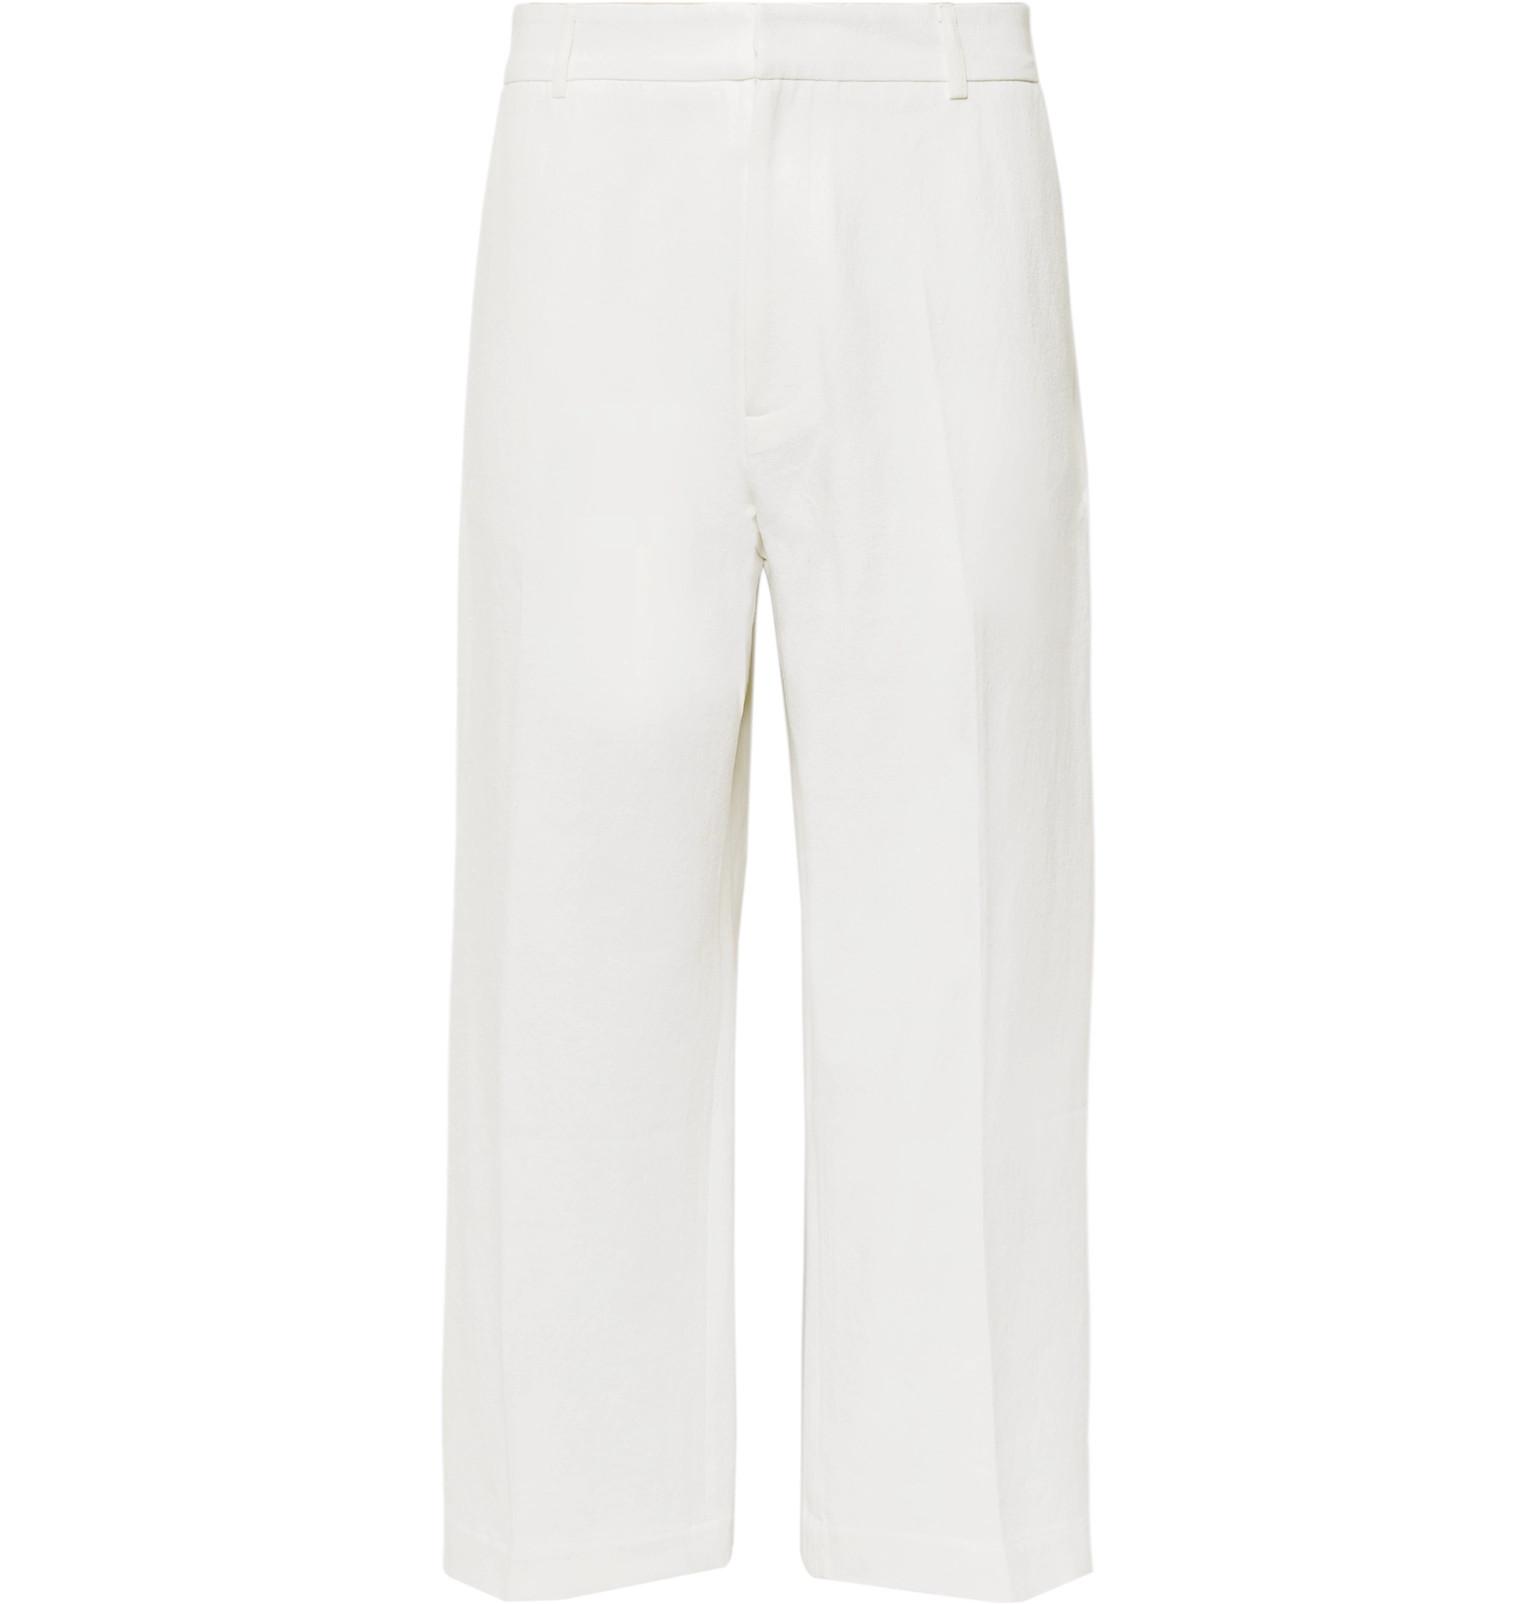 Suedehead Wide-leg Cropped Brushed Cotton-twill Trousers STUDIO NICHOLSON B9jSDmR